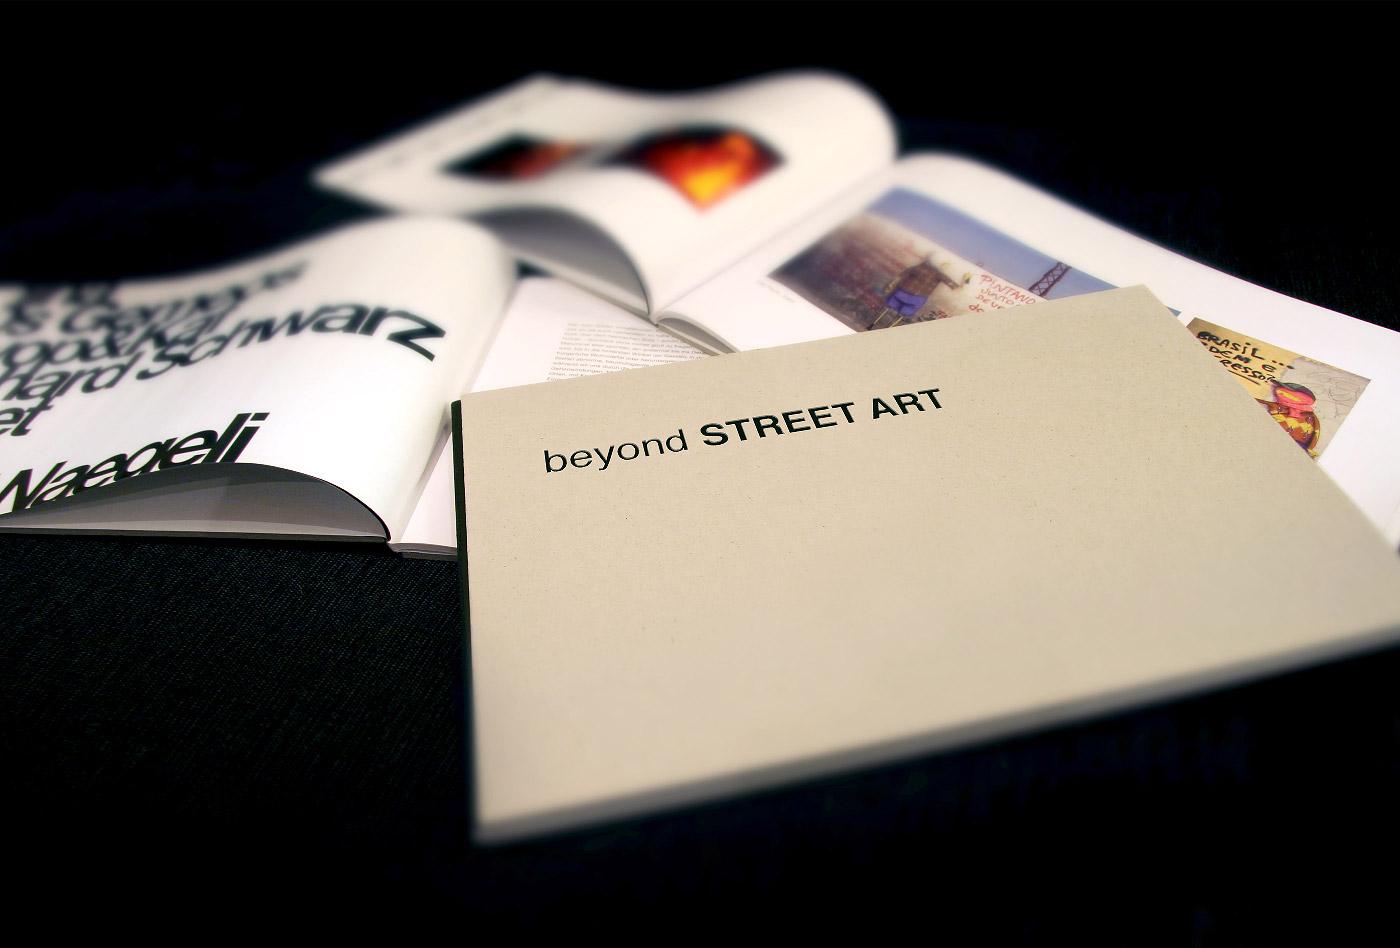 beyond Street Art